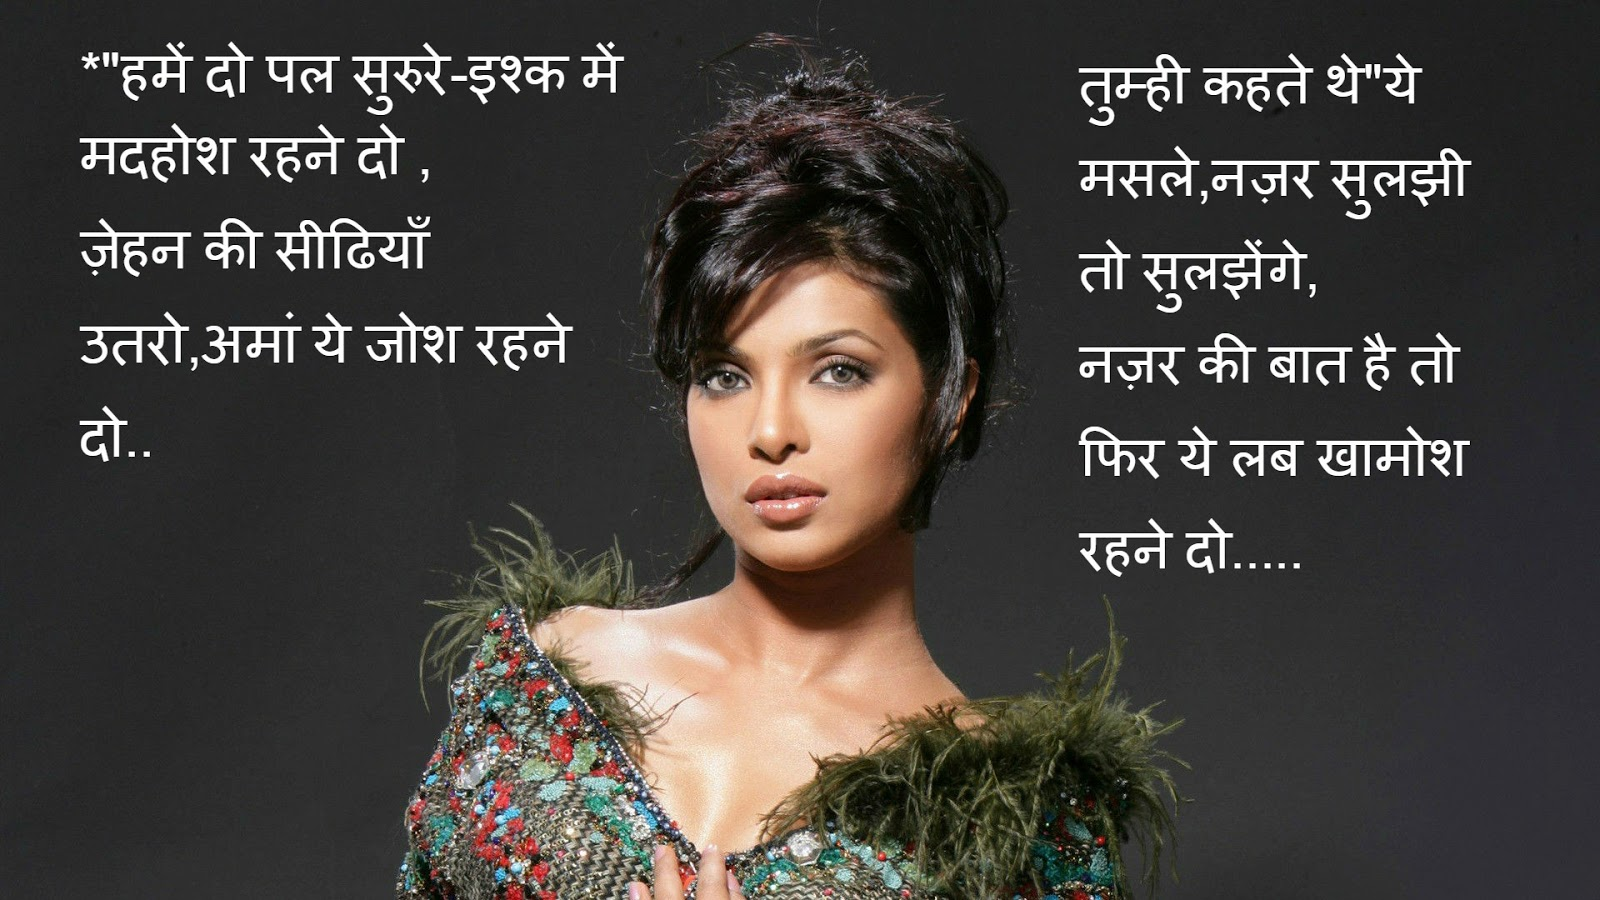 Best 20 Love Shayari In Hindi For Girlfriend New In 2017-3385